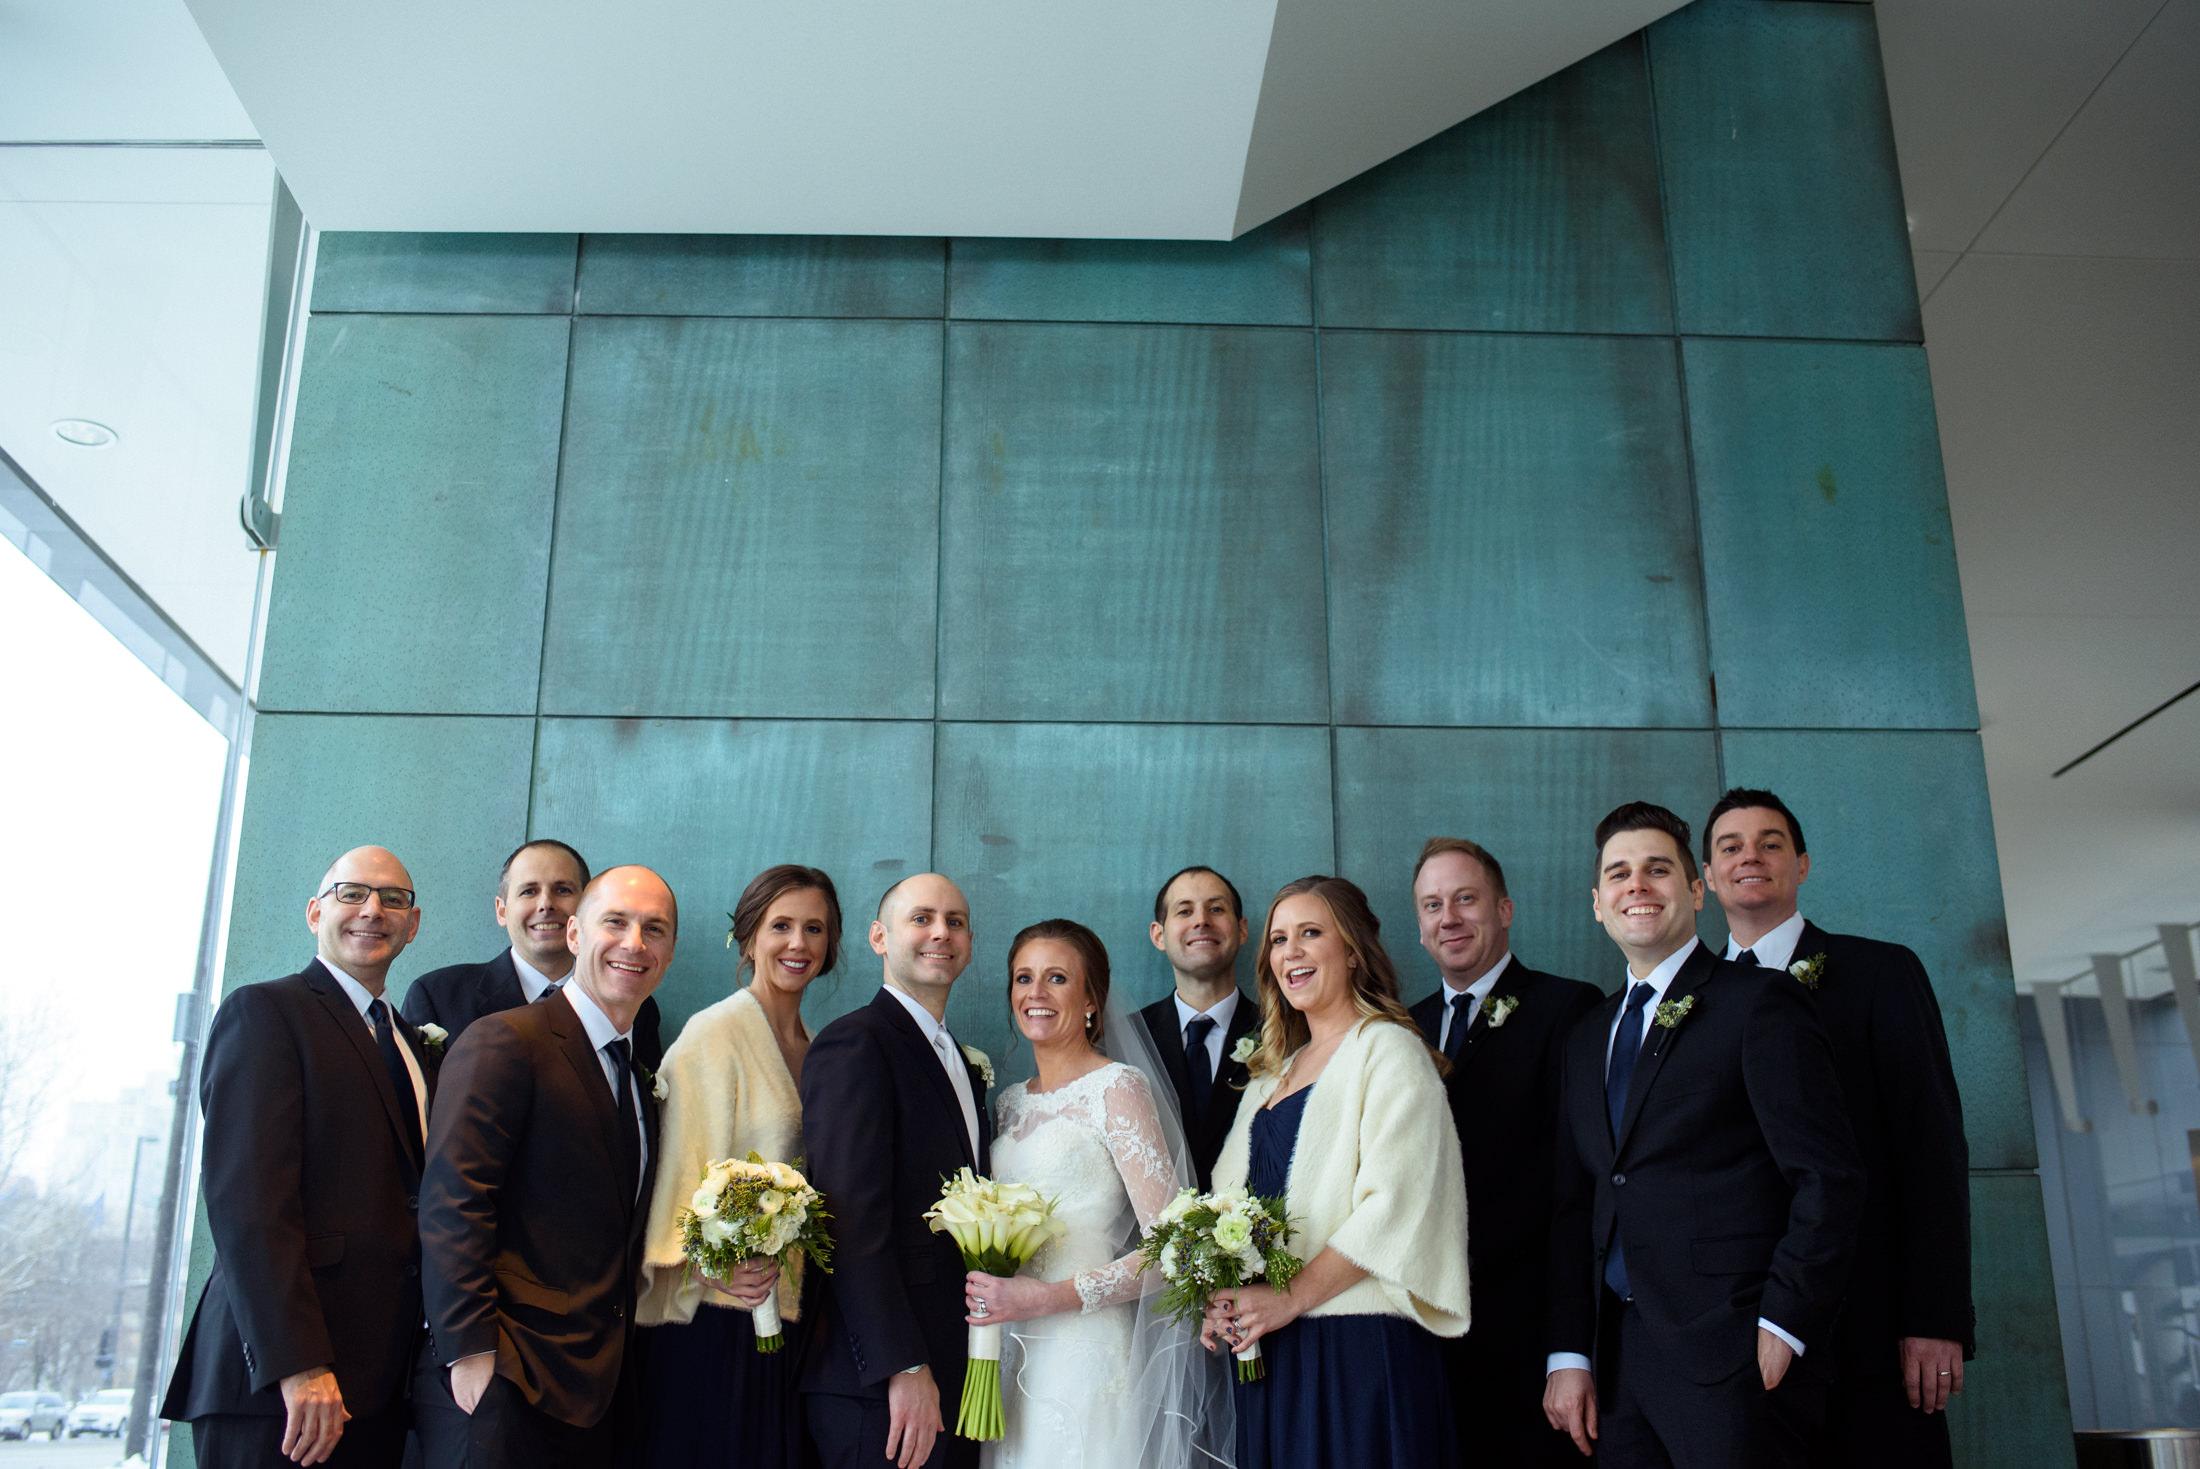 holland-center-reception-omaha-wedding-photographer-0003.JPG